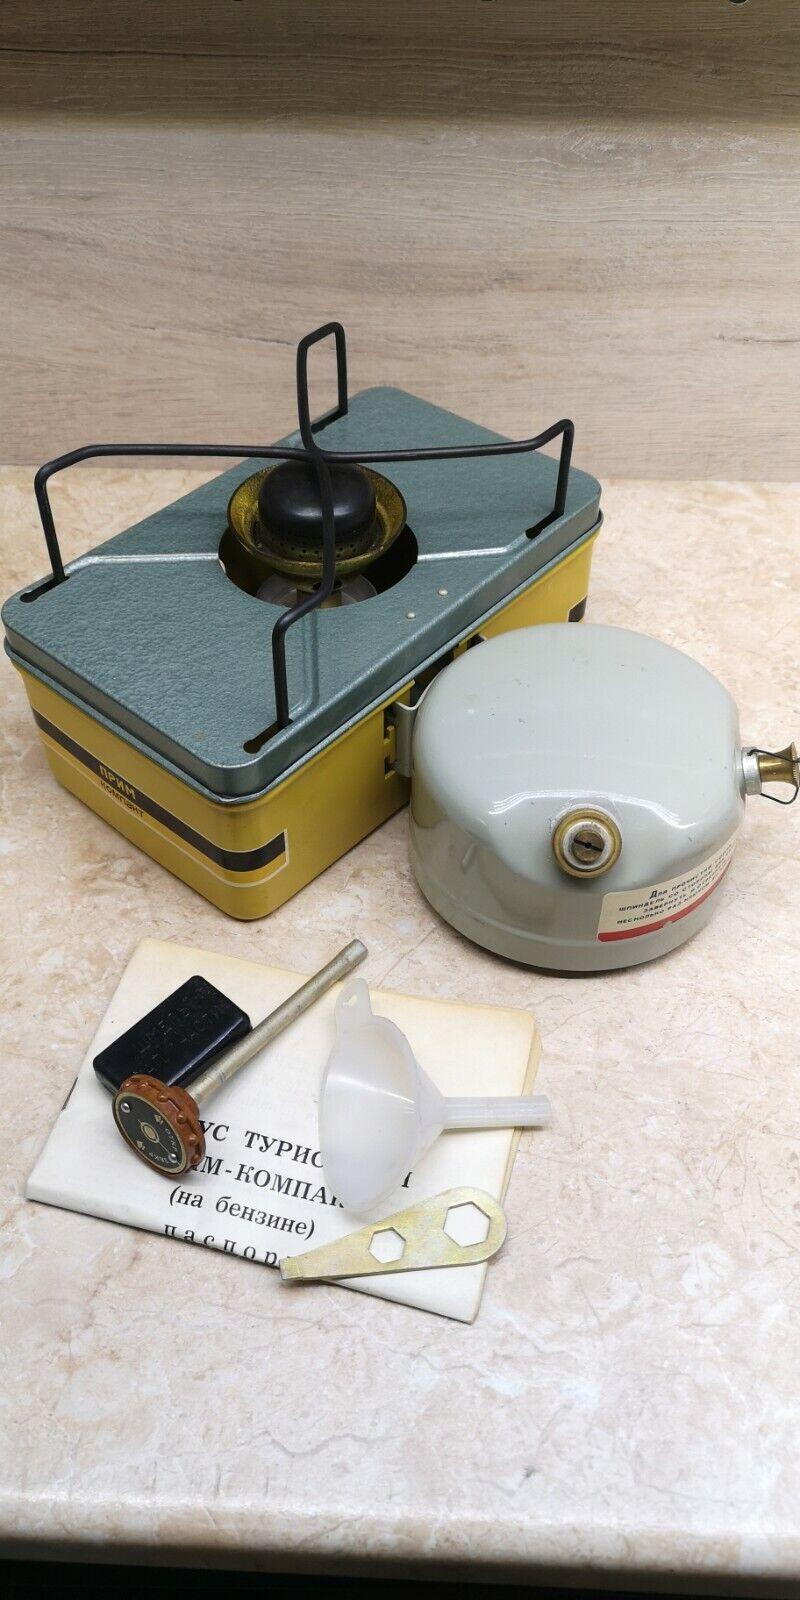 Prim-compact, camping stove, optimus, military, benzinkocher, Réchaud Stove